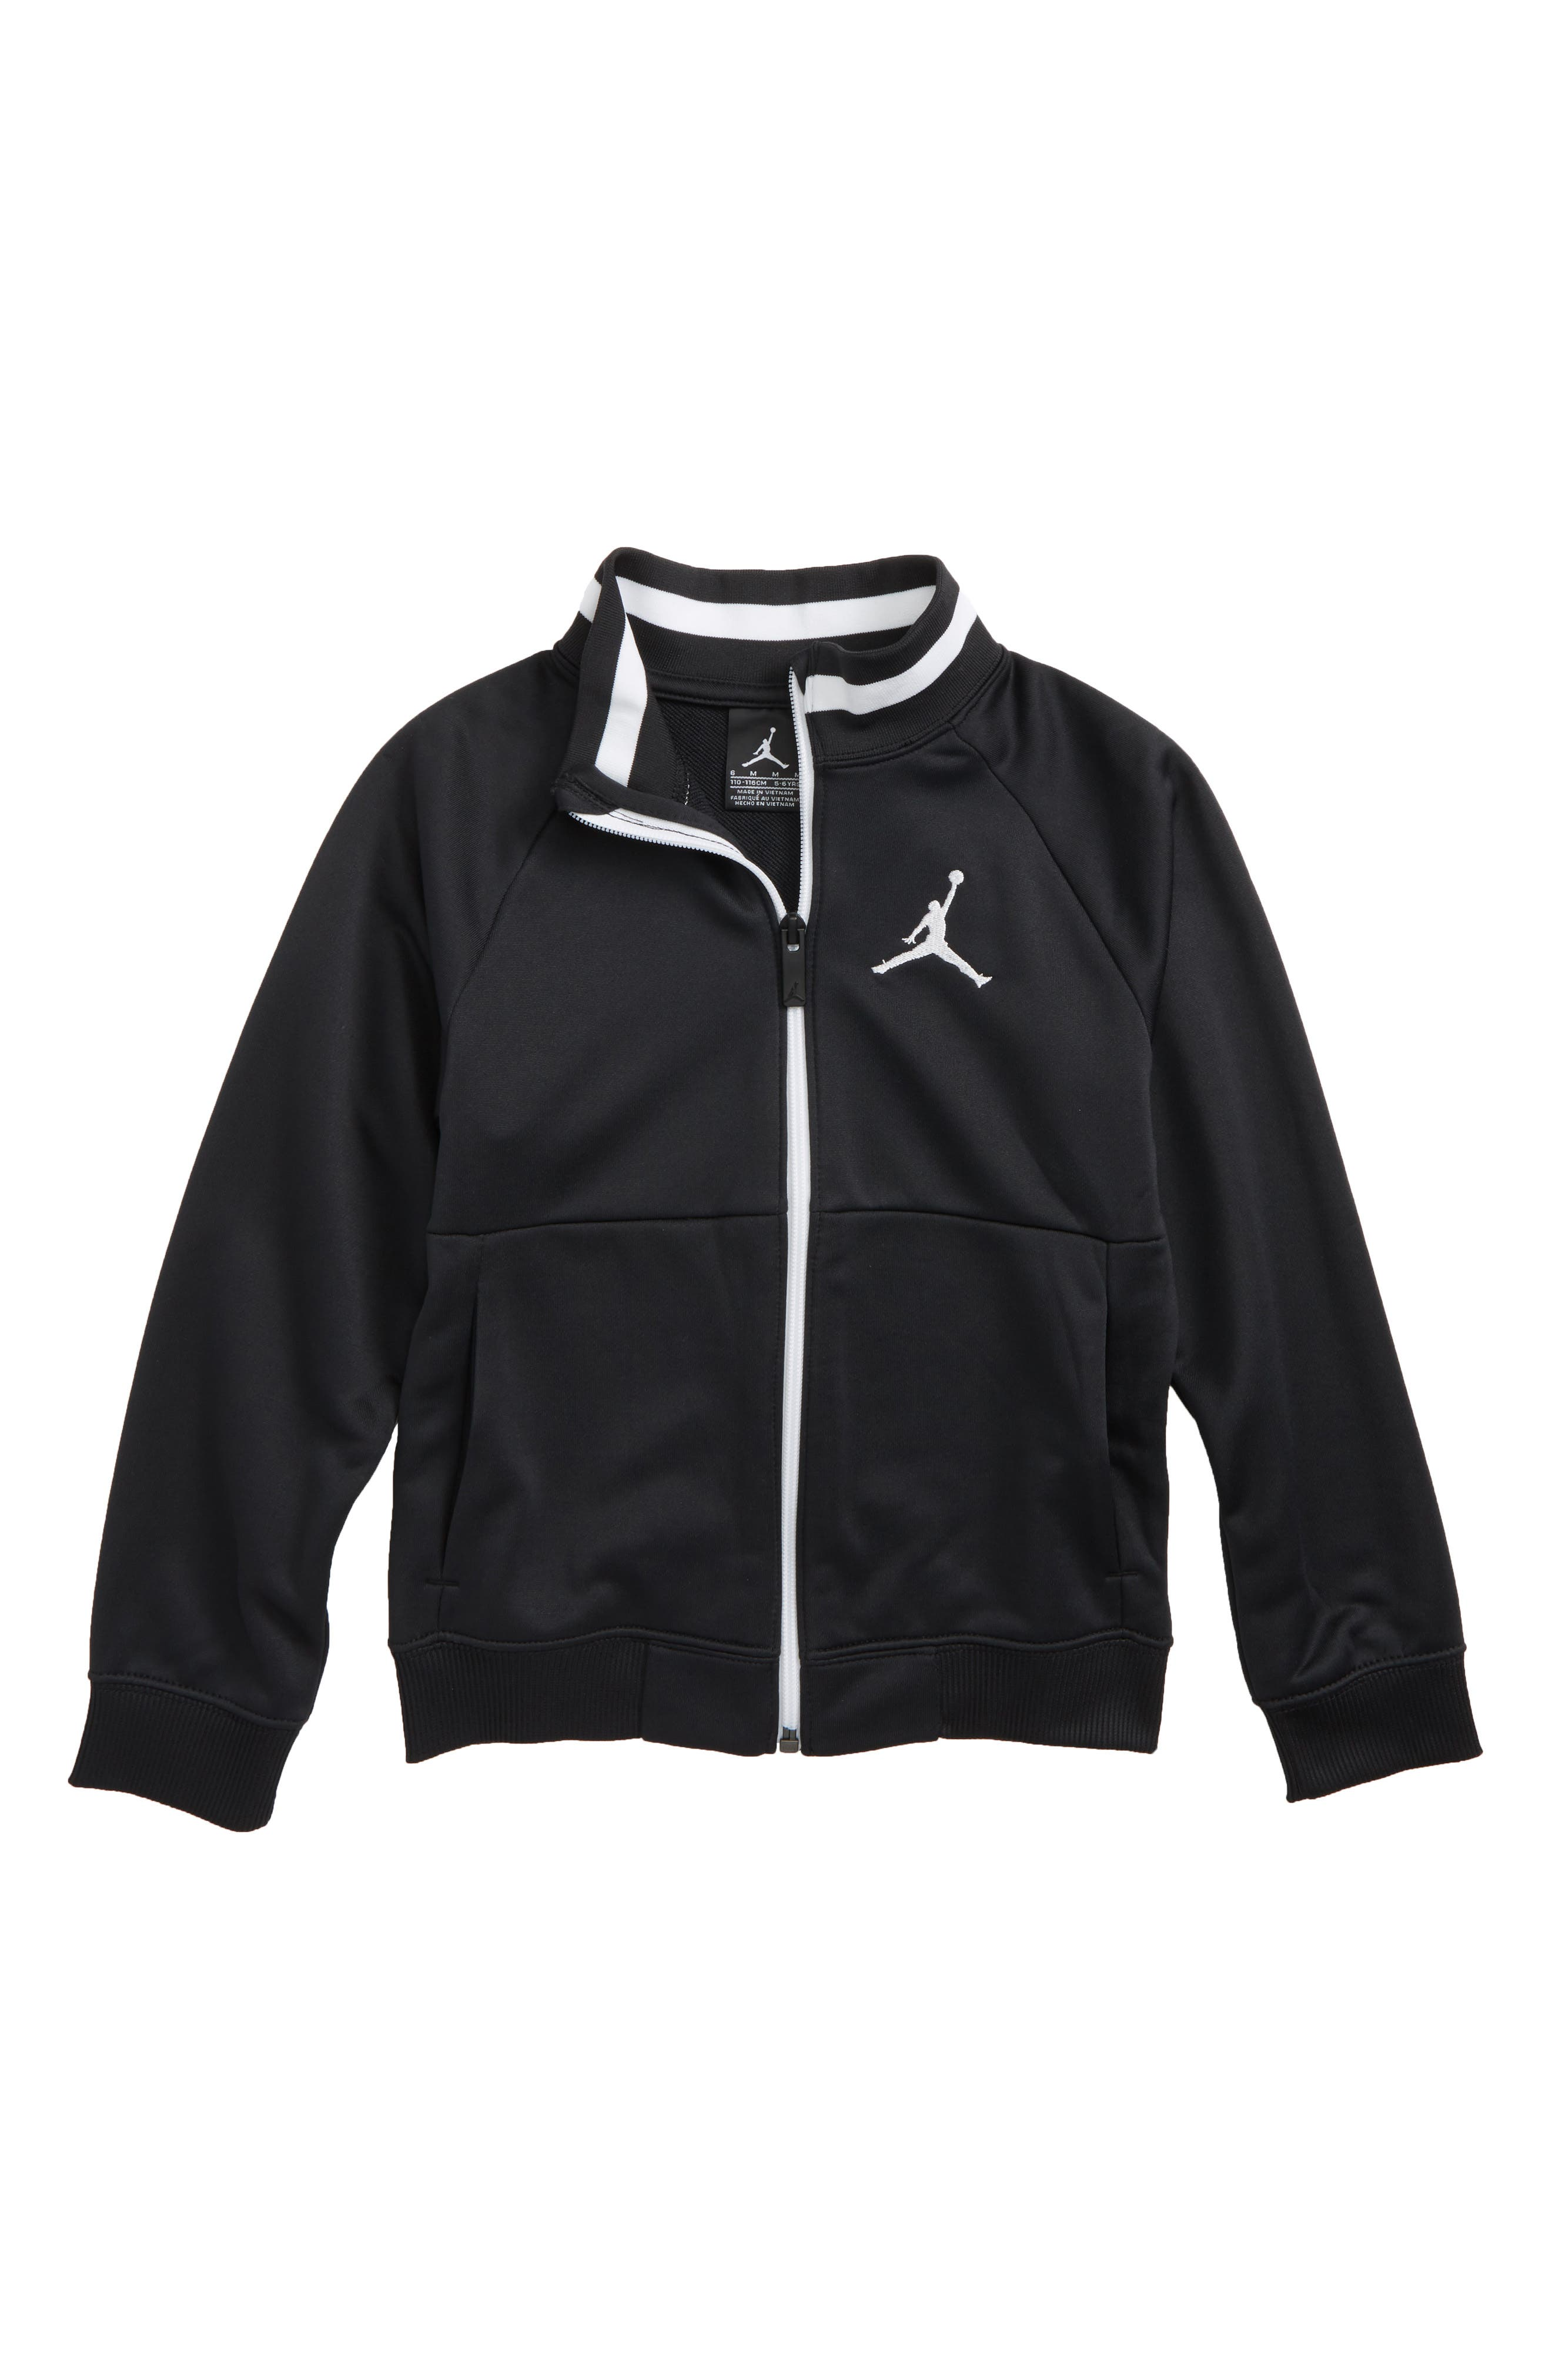 Jordan '90s Tricot Jacket,                             Main thumbnail 1, color,                             004